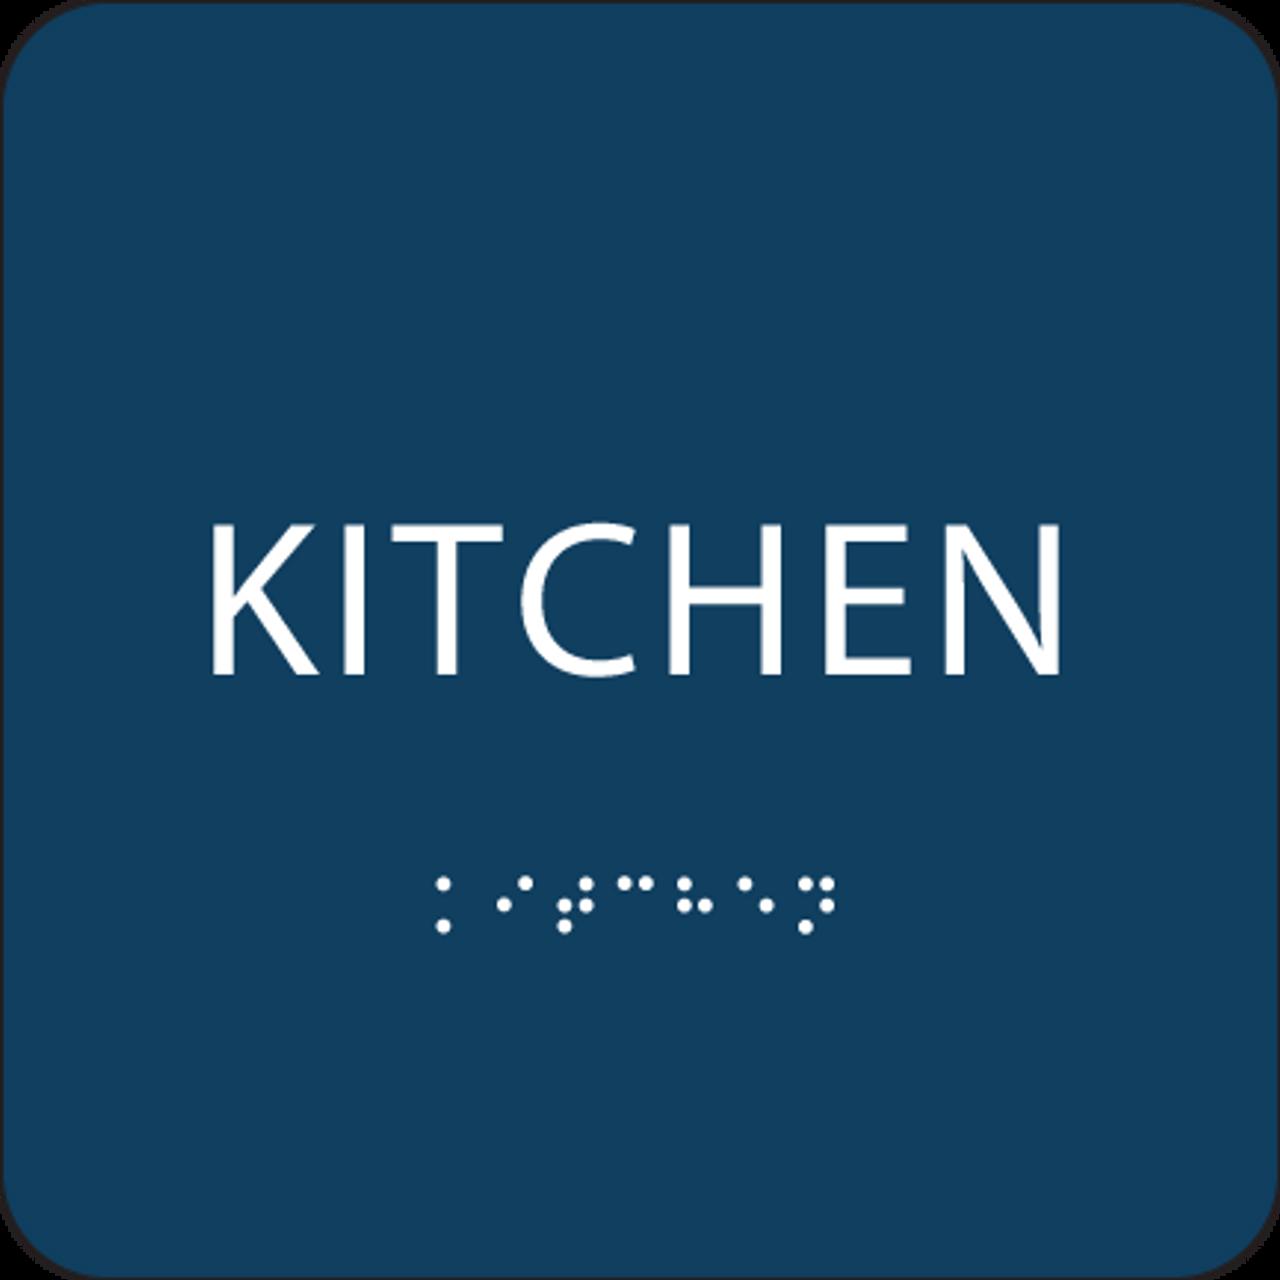 Blue Tactile Kitchen Sign